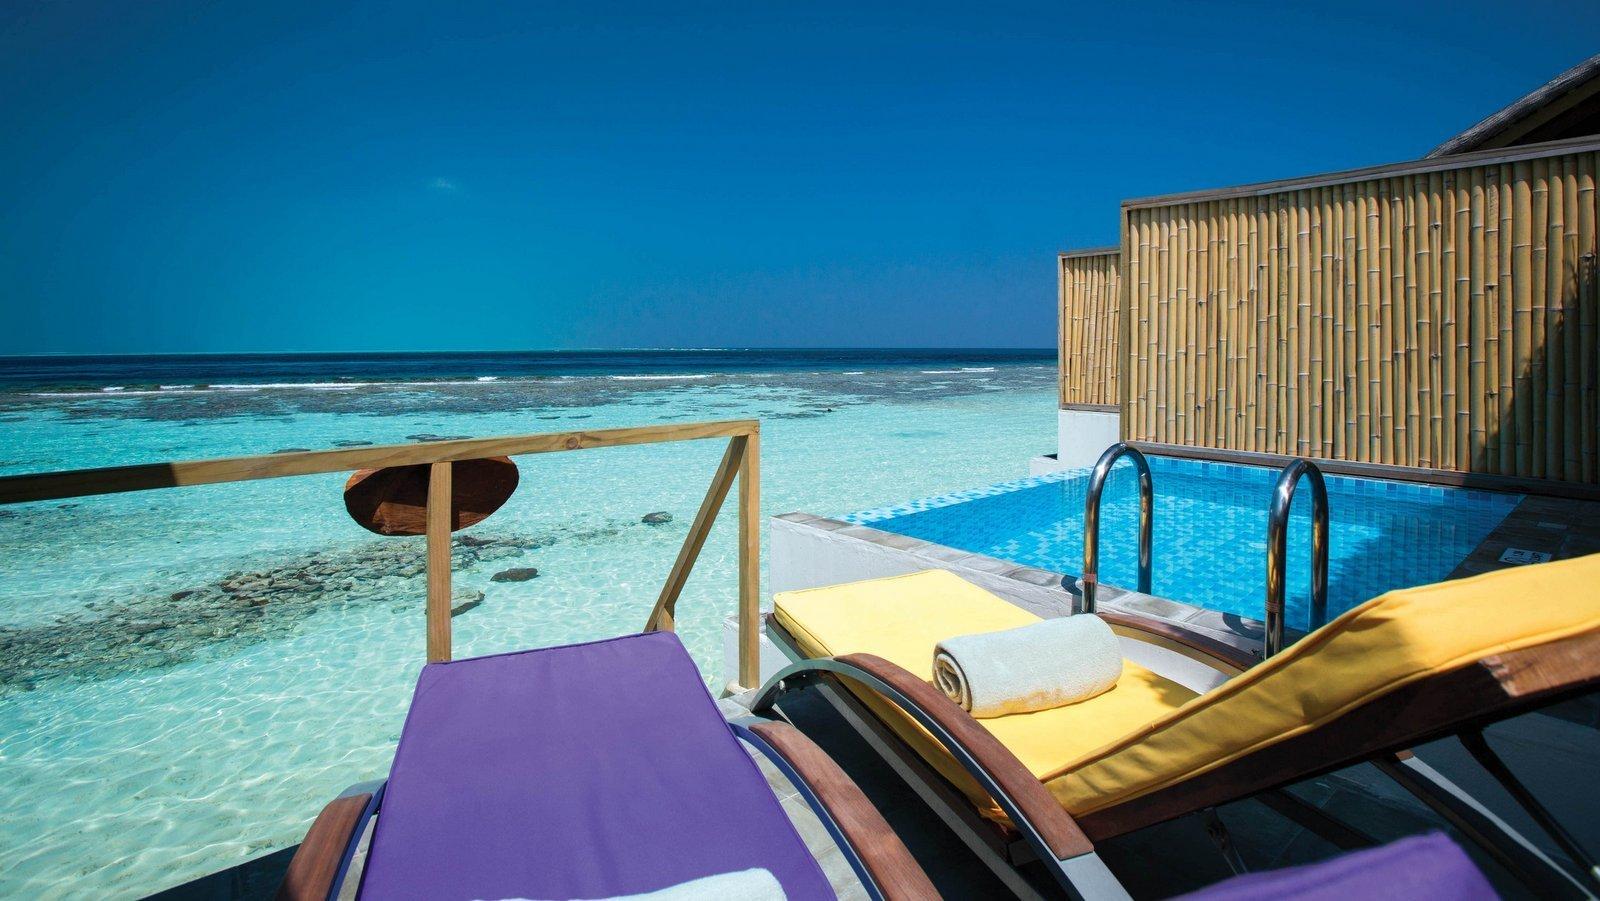 Мальдивы, отель OBLU by Atmosphere at Helengeli, номер Water Villa with Pool